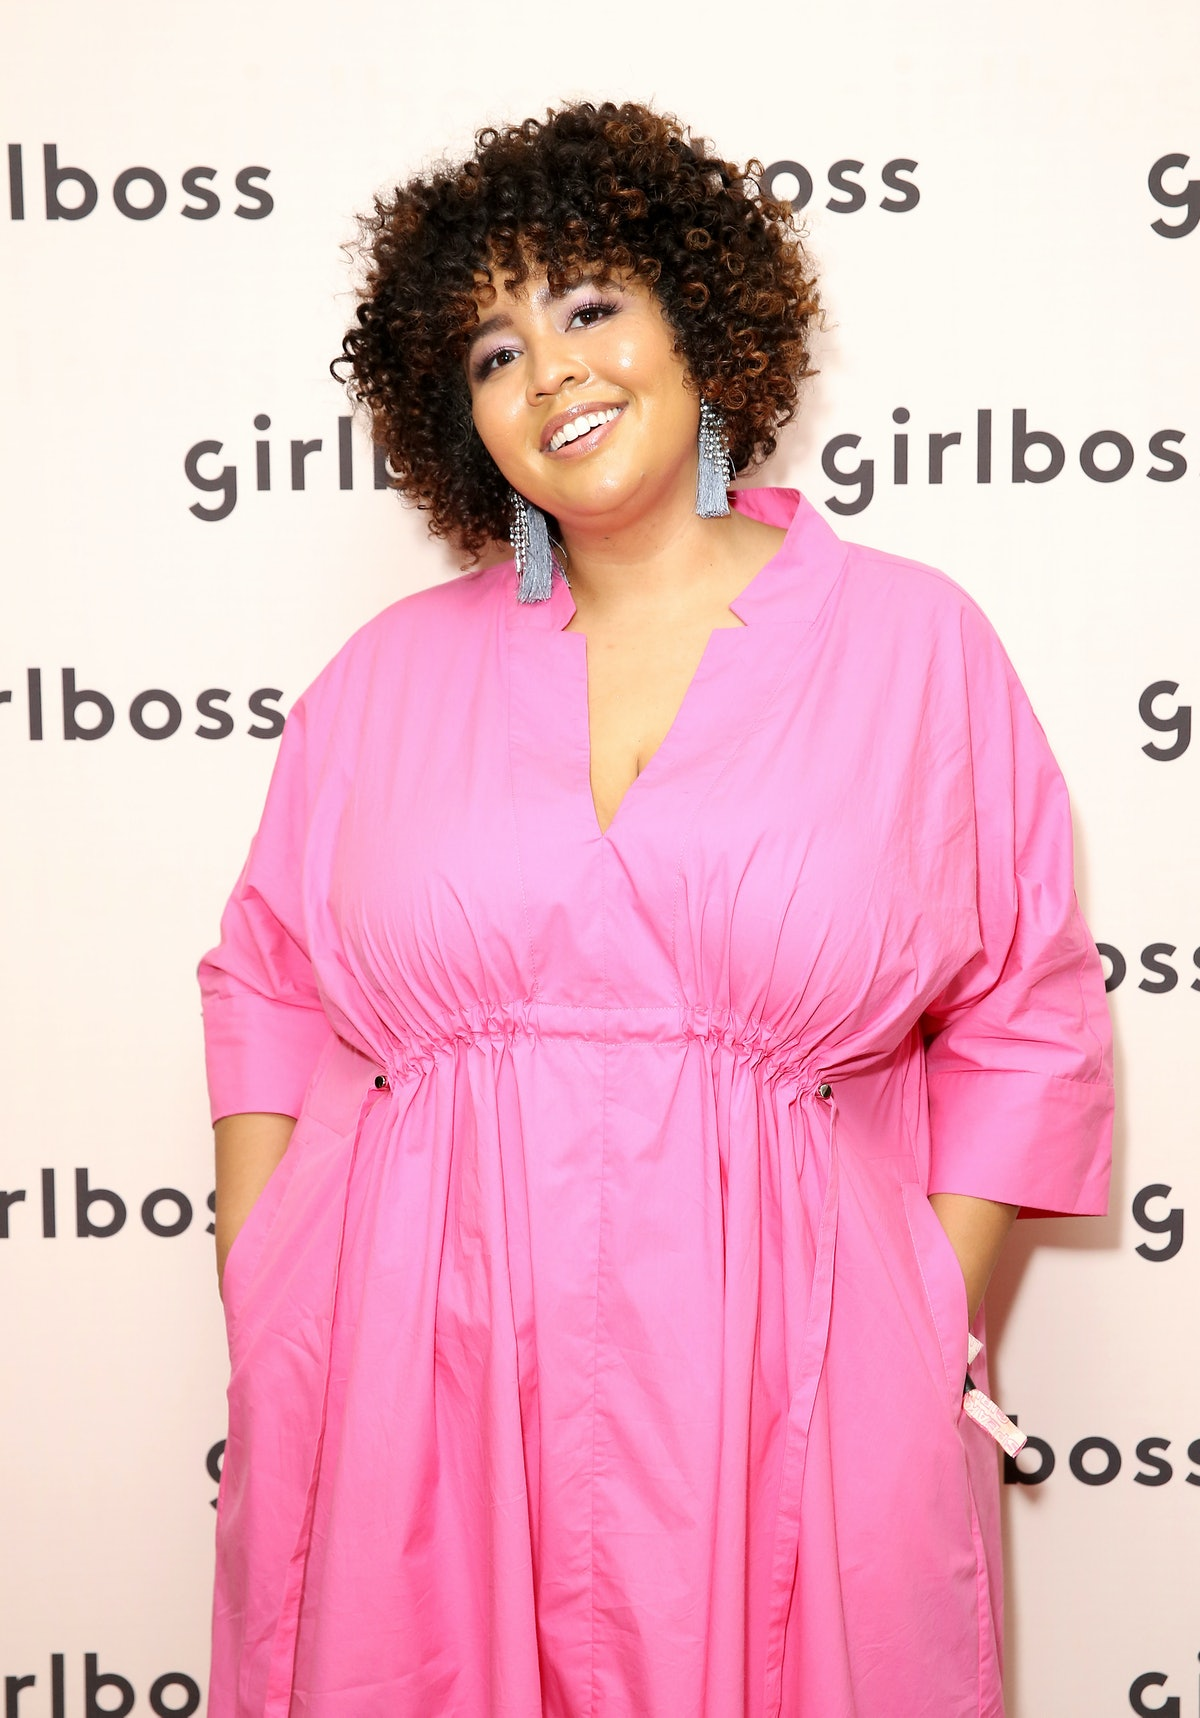 Gabi Gregg attends an event for Girl Boss.